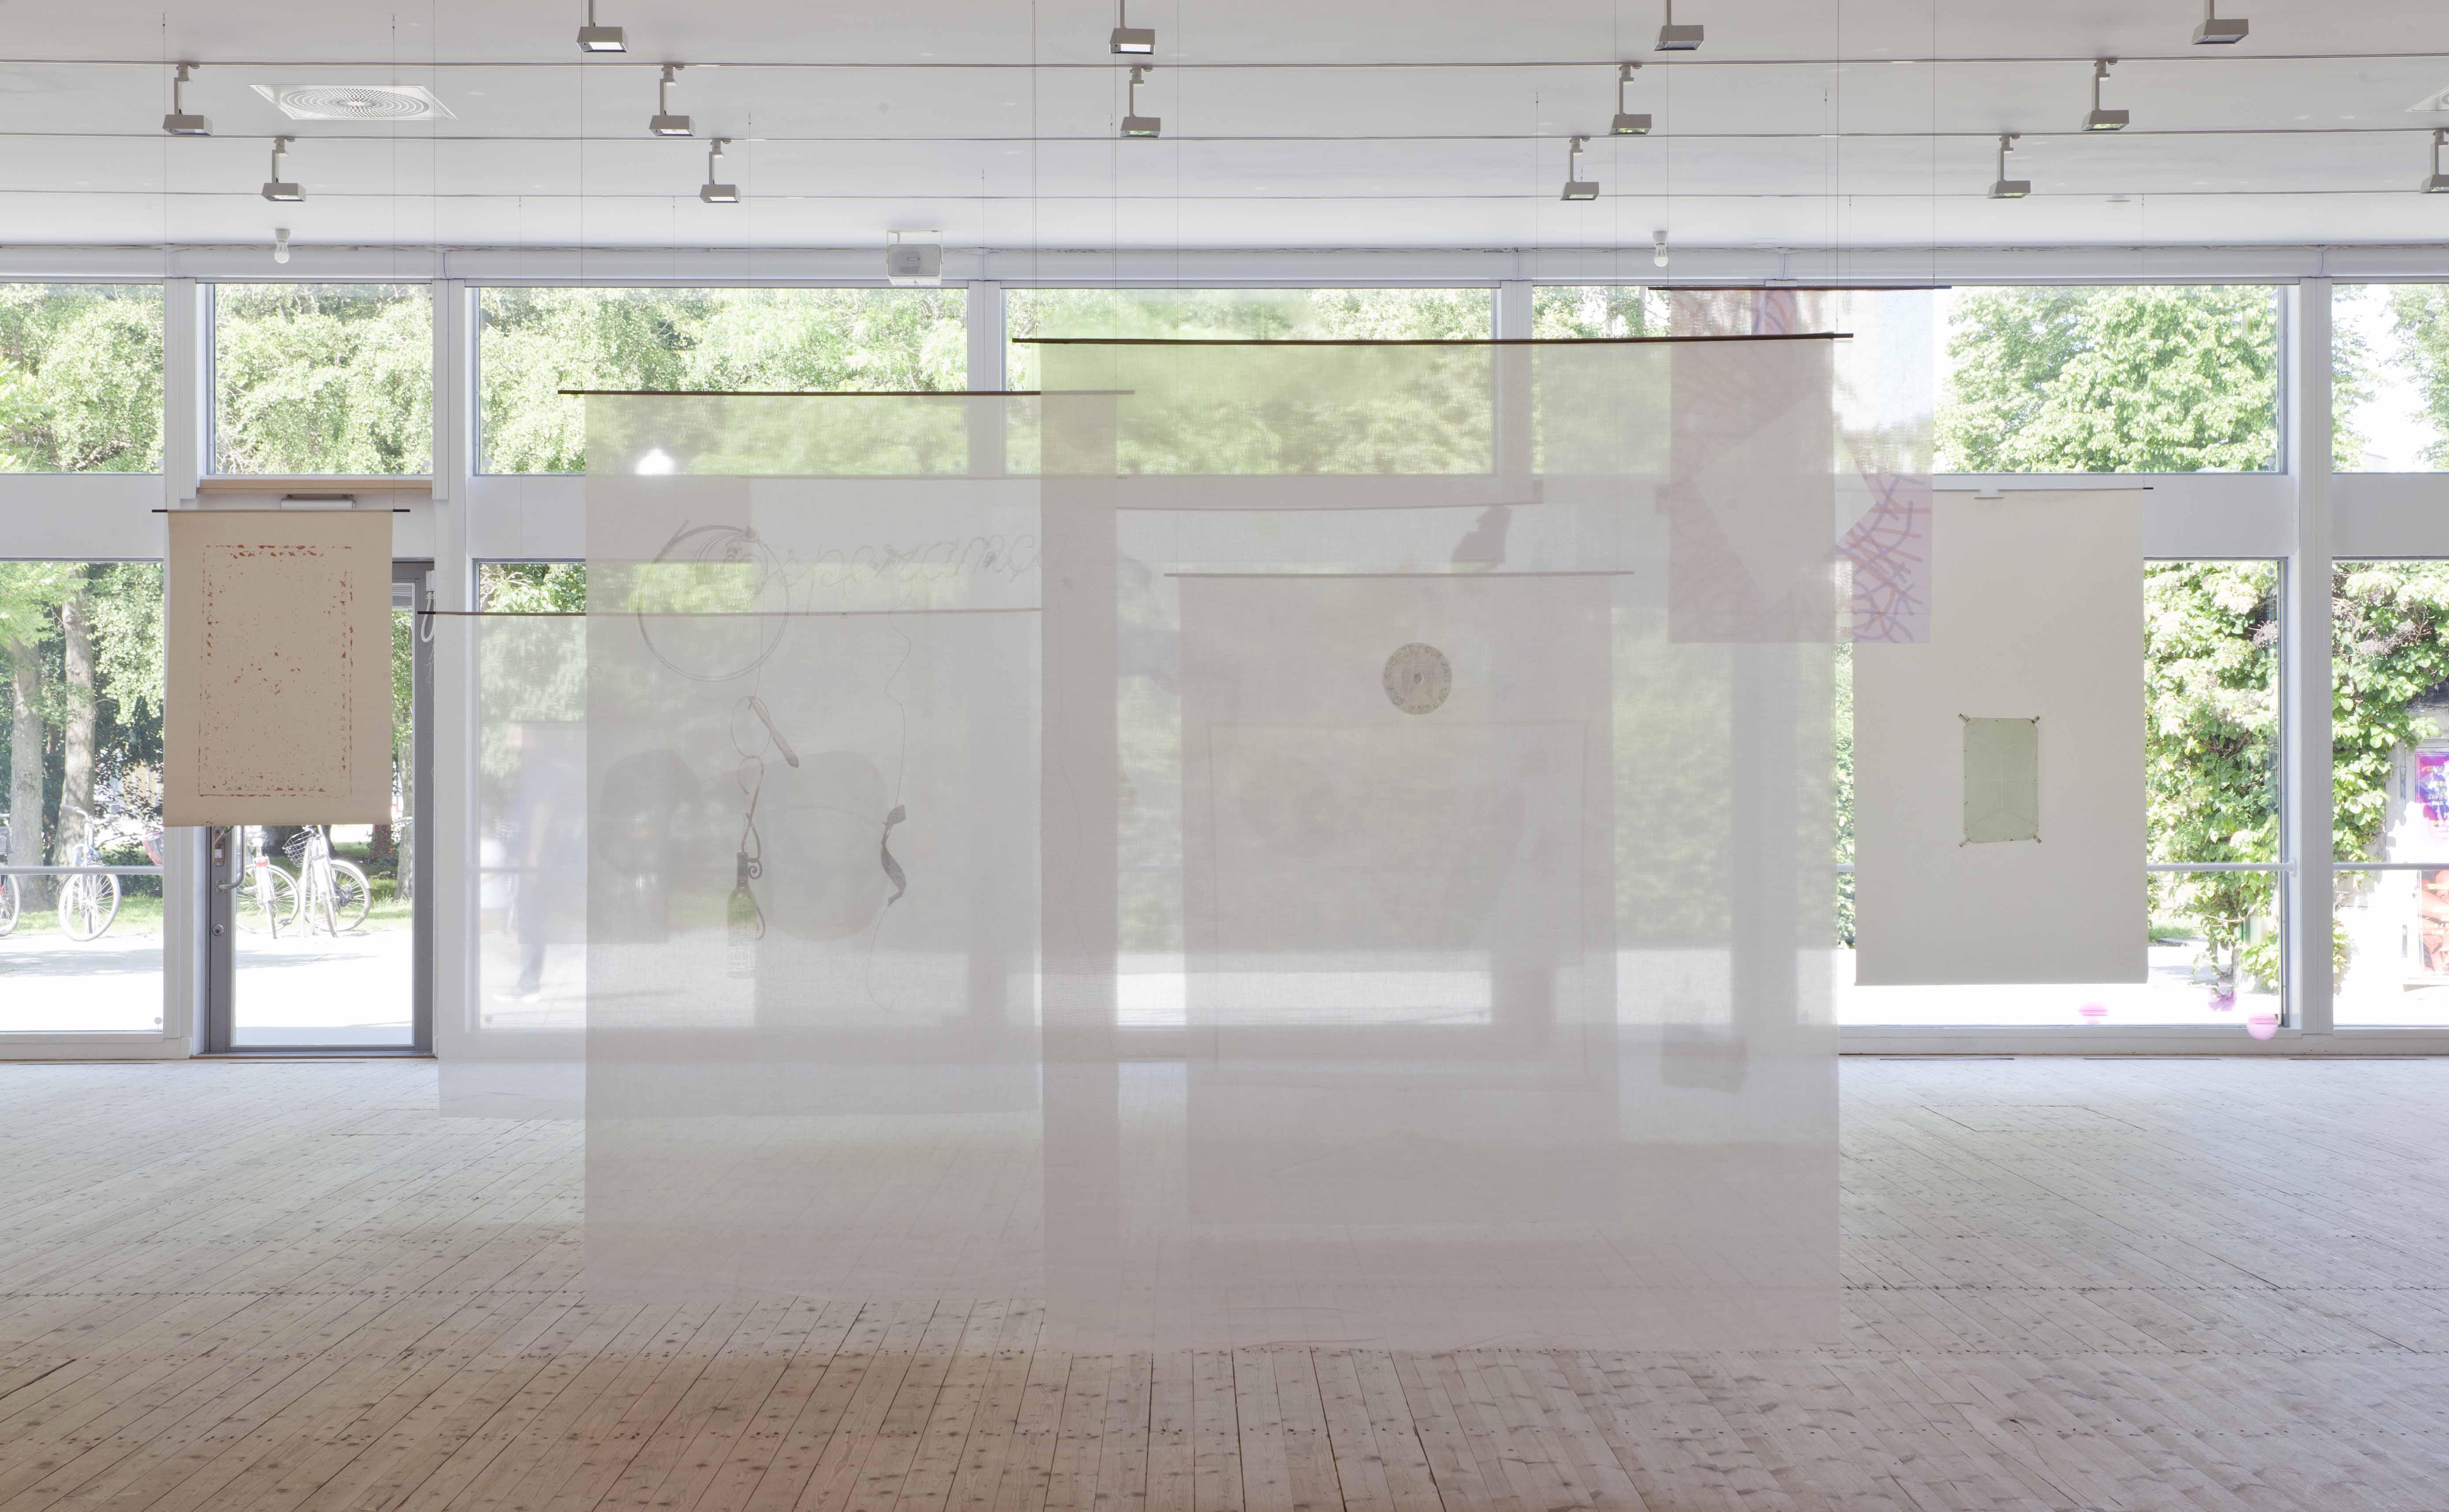 Life, Work, References, 2016. Installation view: Three Moral Tales, Malmö Konsthall, 2019 |  | ProjecteSD